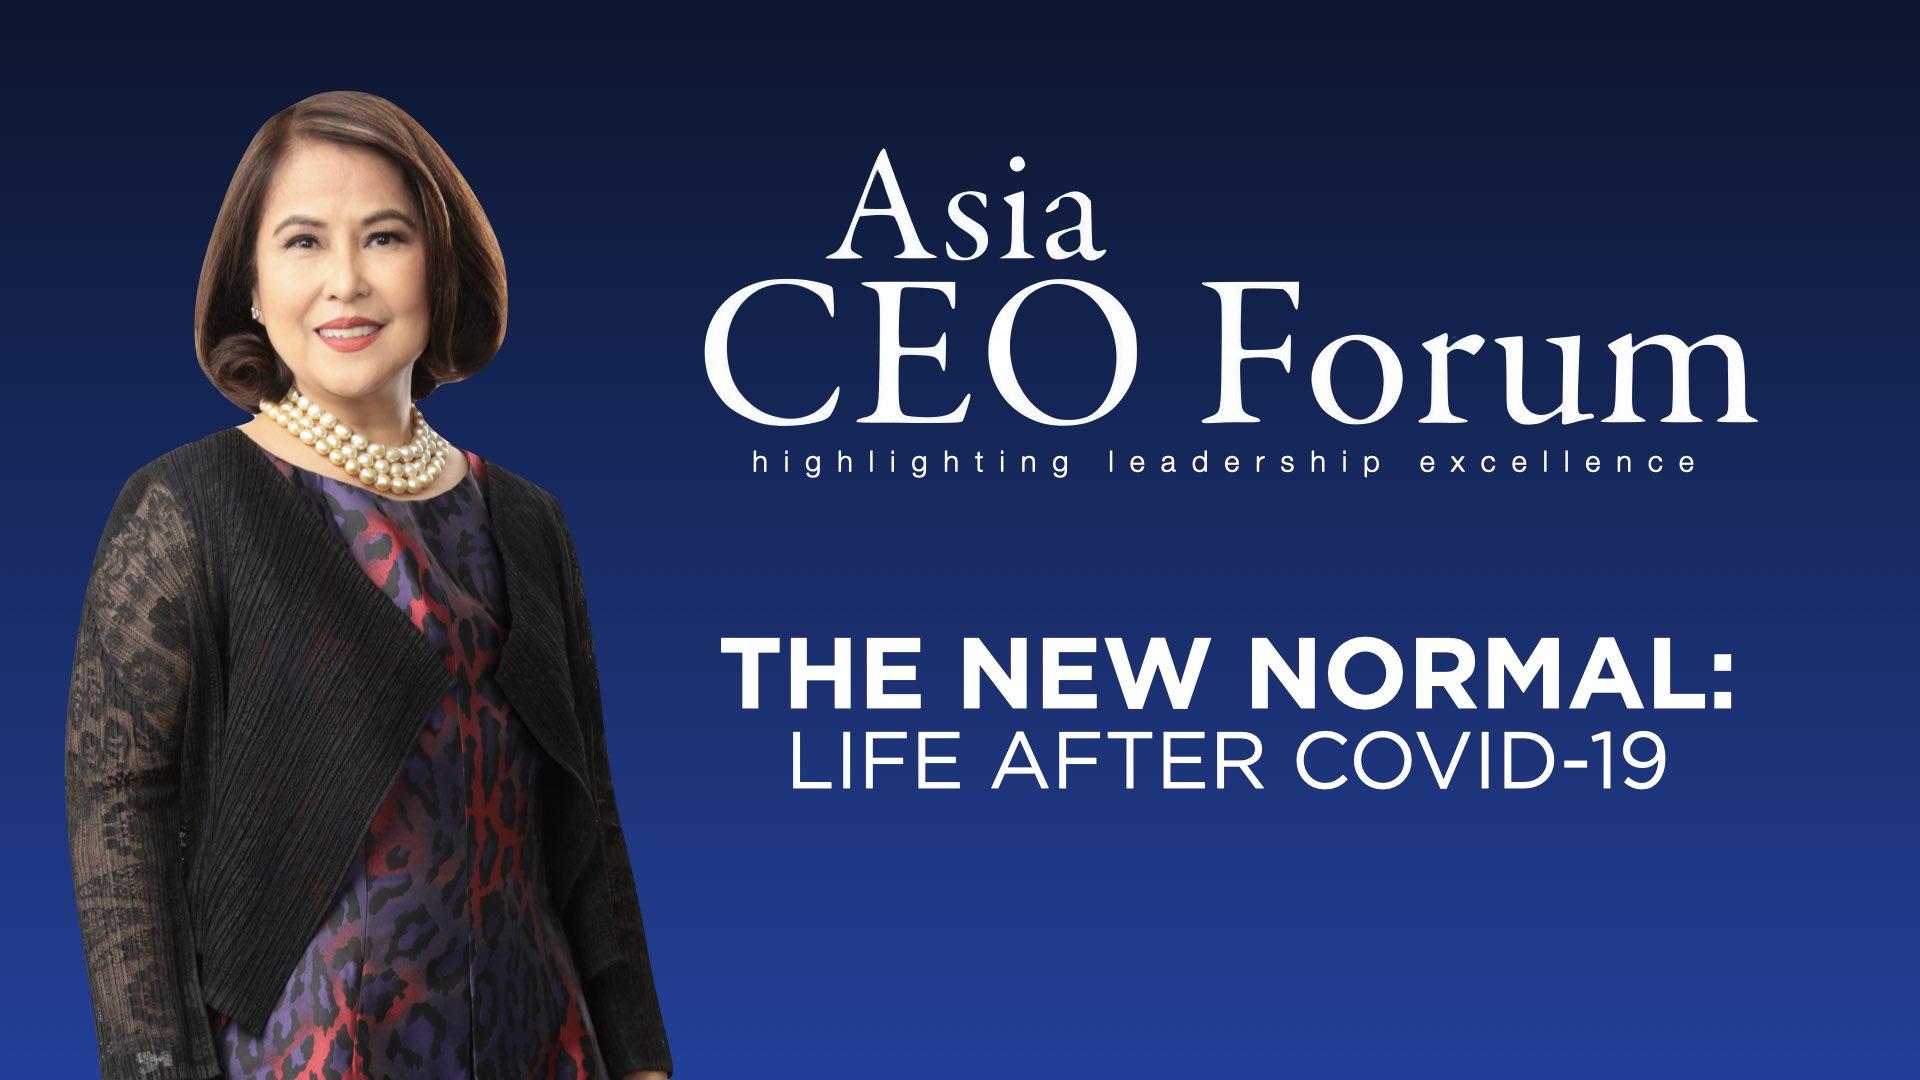 InLife Executive Chairman Nina Aguas on Life After COVID-19